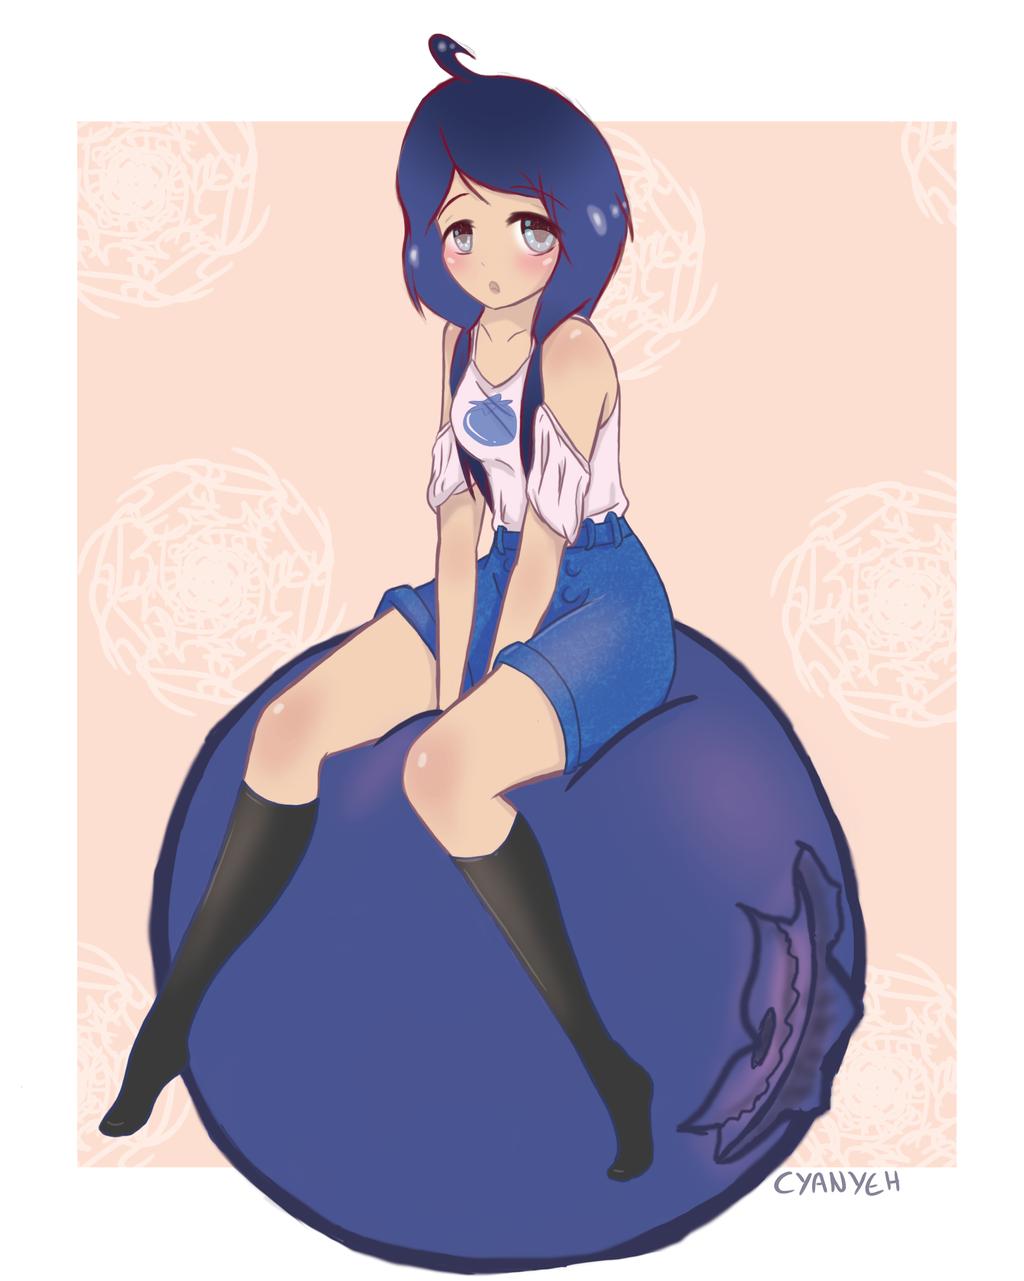 Blueberry Girl by Cyanyeh